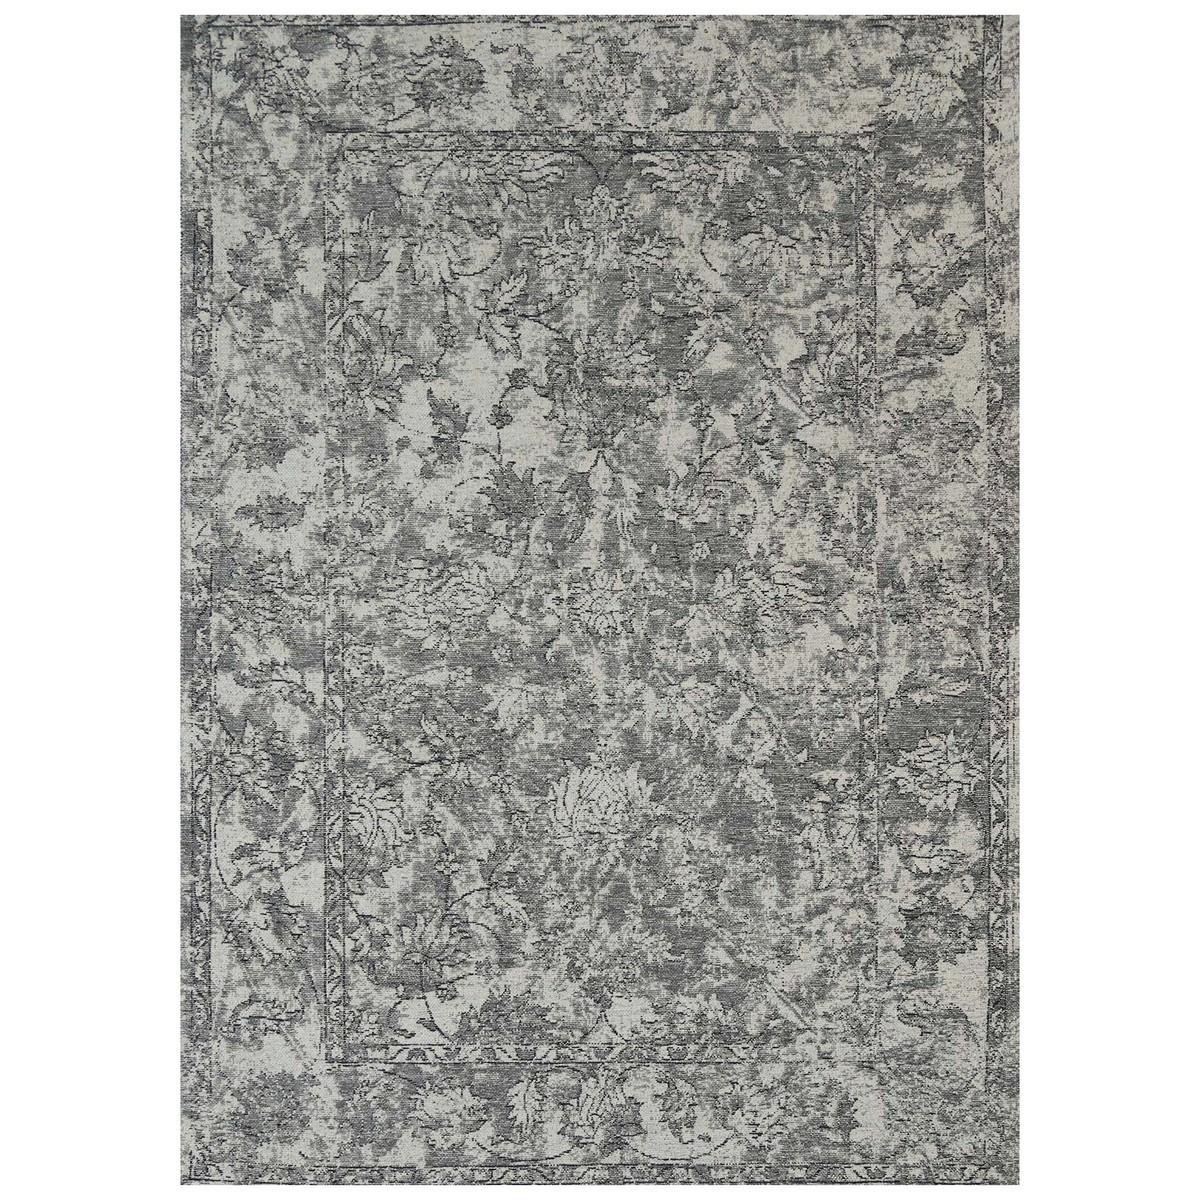 Celeste Chenille & Cotton Bohemian Boarder Rug, 120x170cm, Grey